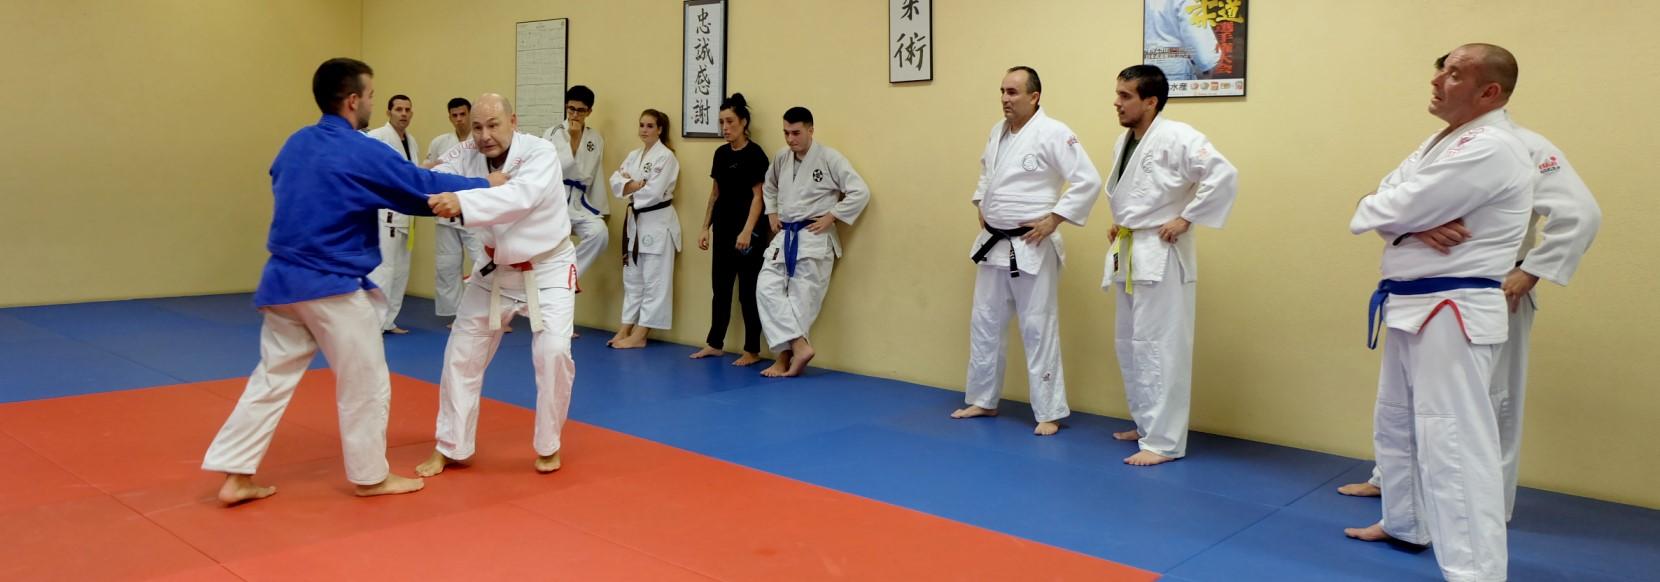 Jiu Jitsu Club Esportiu Pantiquet, gimnasio con piscina en Mollet del Valles, Barcelona